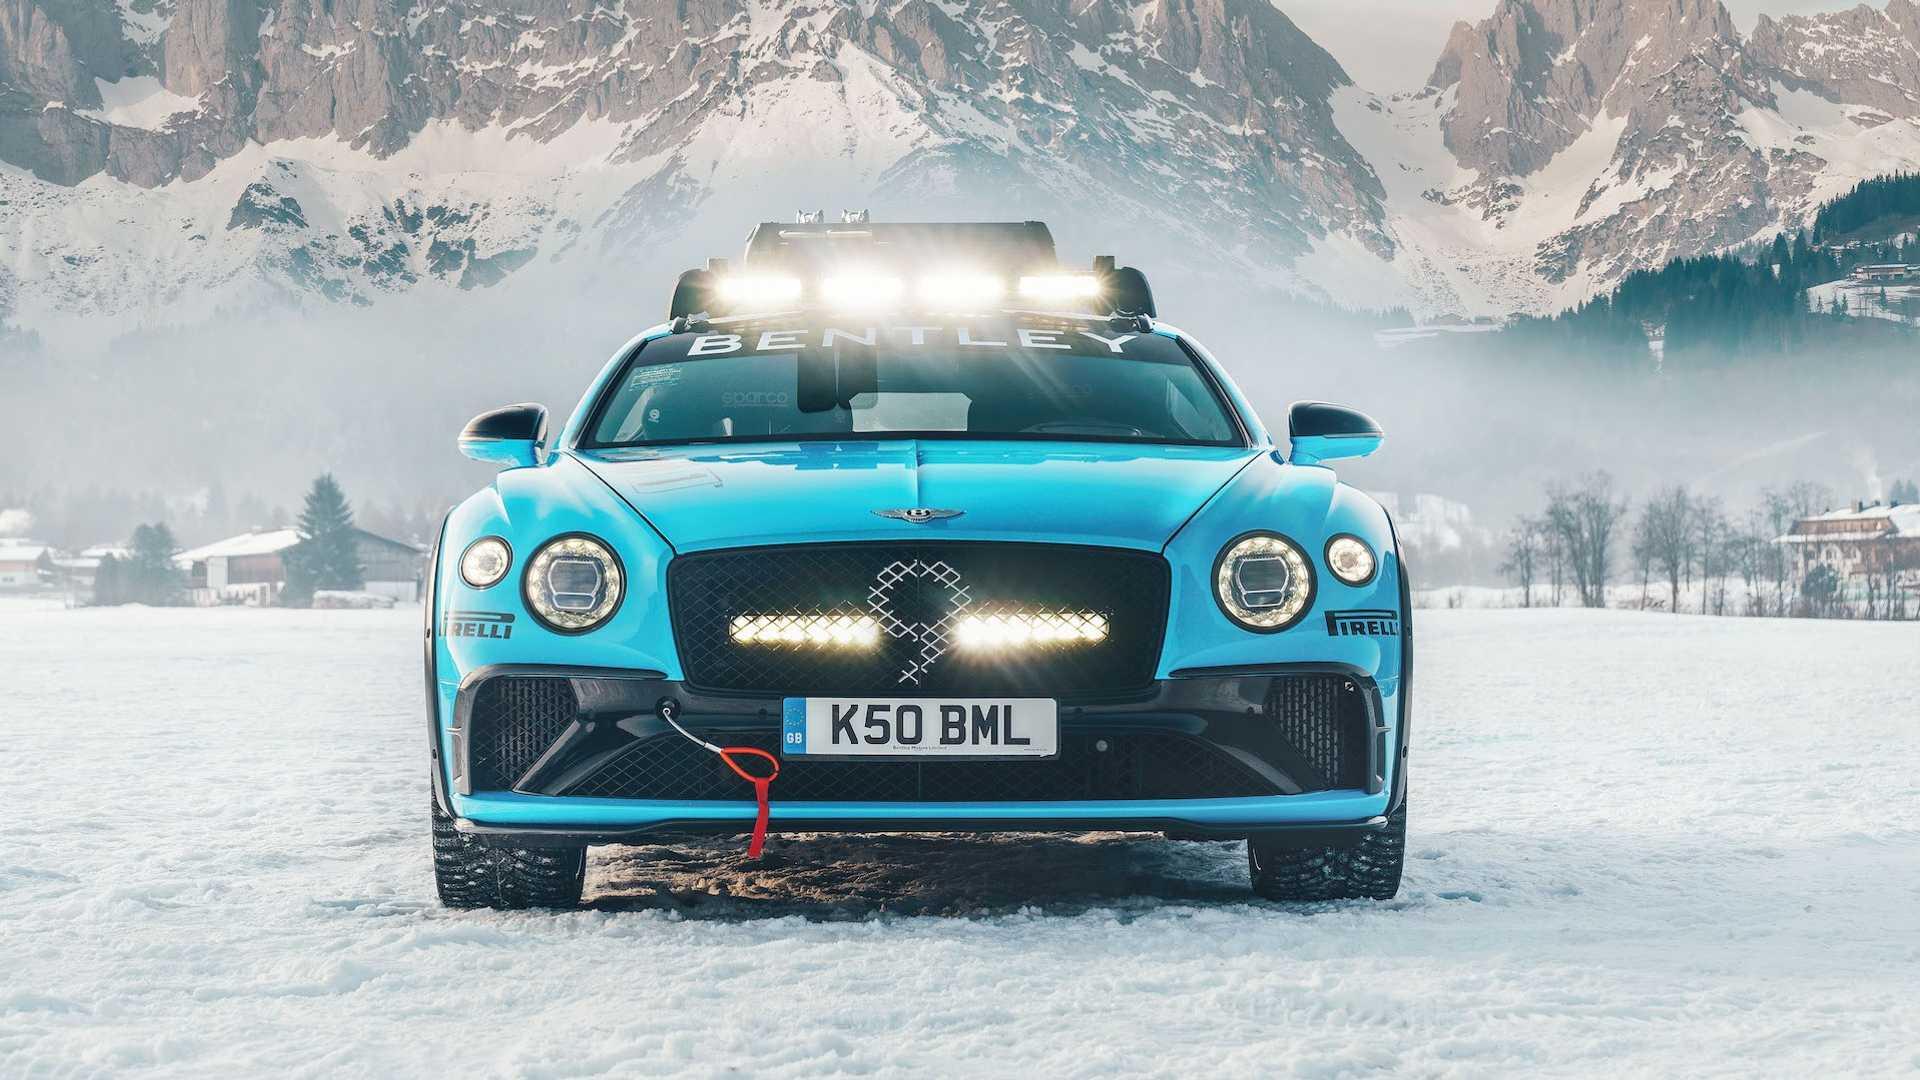 bentley continental gt curse ice race